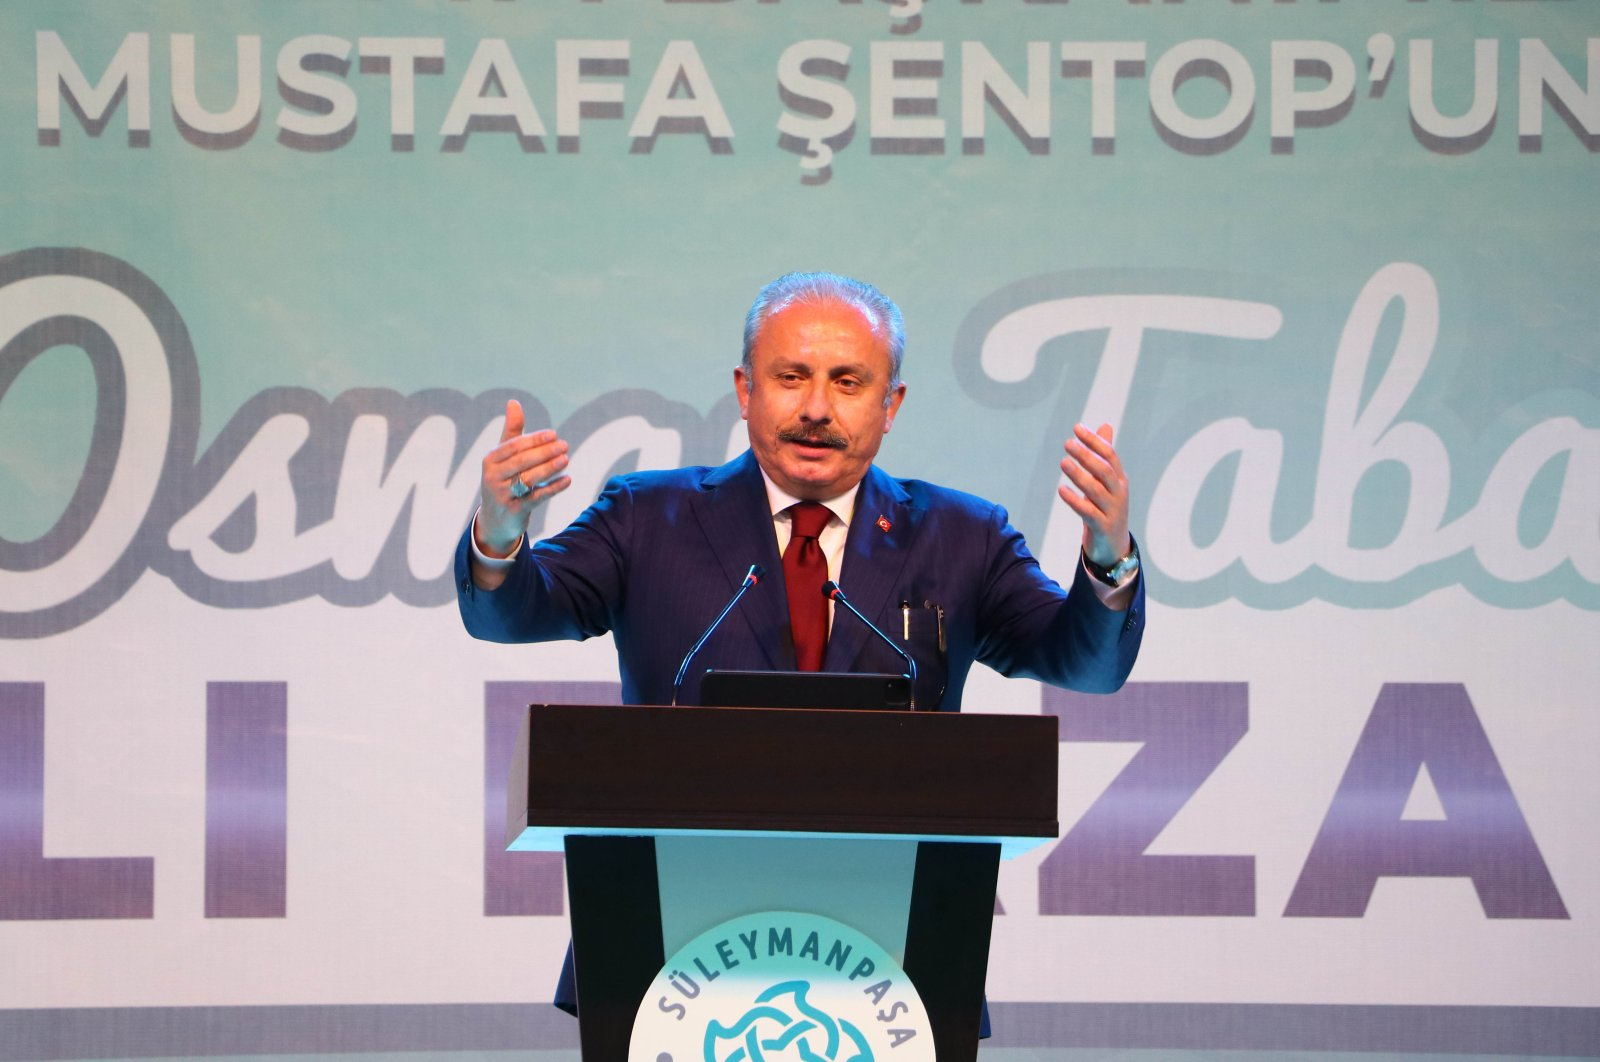 Parliament Speaker Mustafa Şentop speaks during a conference in northwestern Tekirdağ province, Turkey, March 19, 2021. (AA Photo)